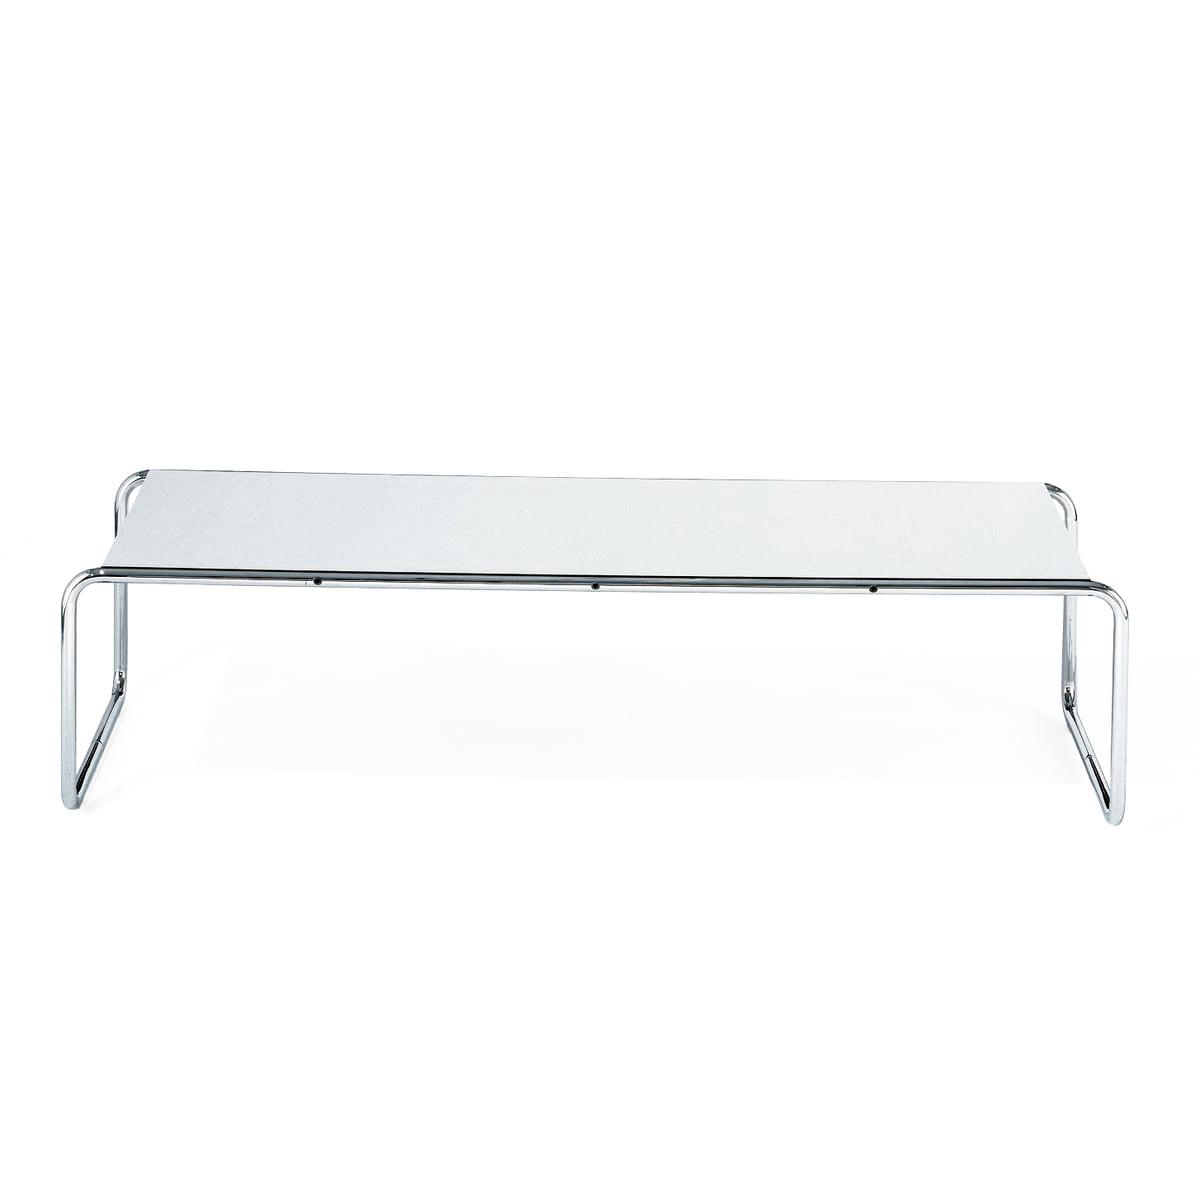 Knoll Laccio 2 Table Basse Blanc